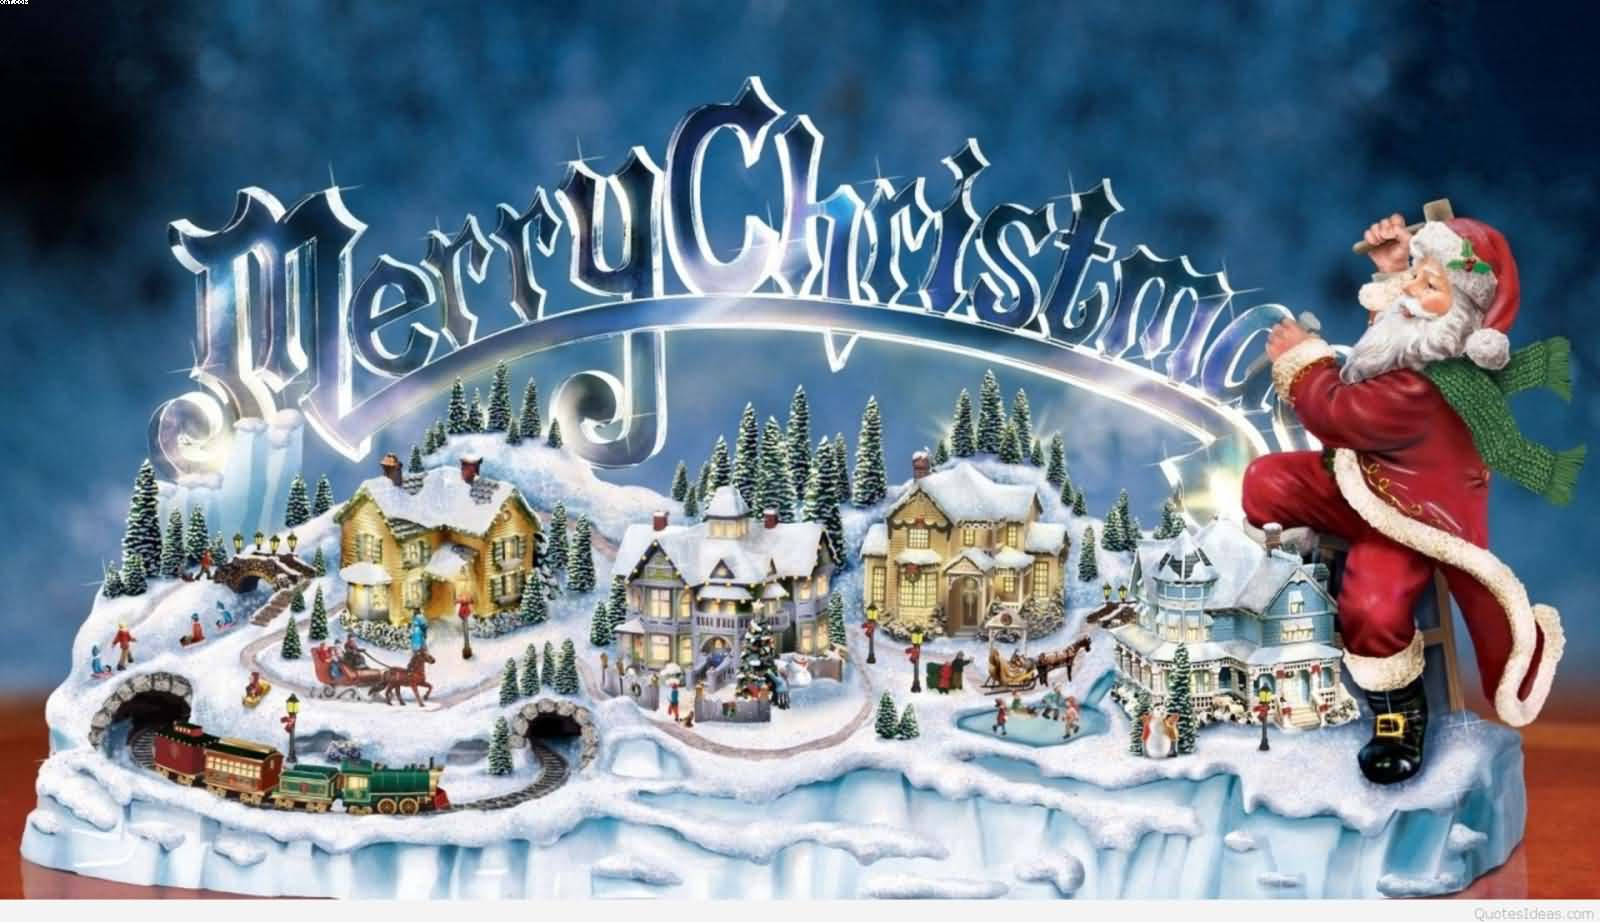 Merry Christmas beautiful wallpaper